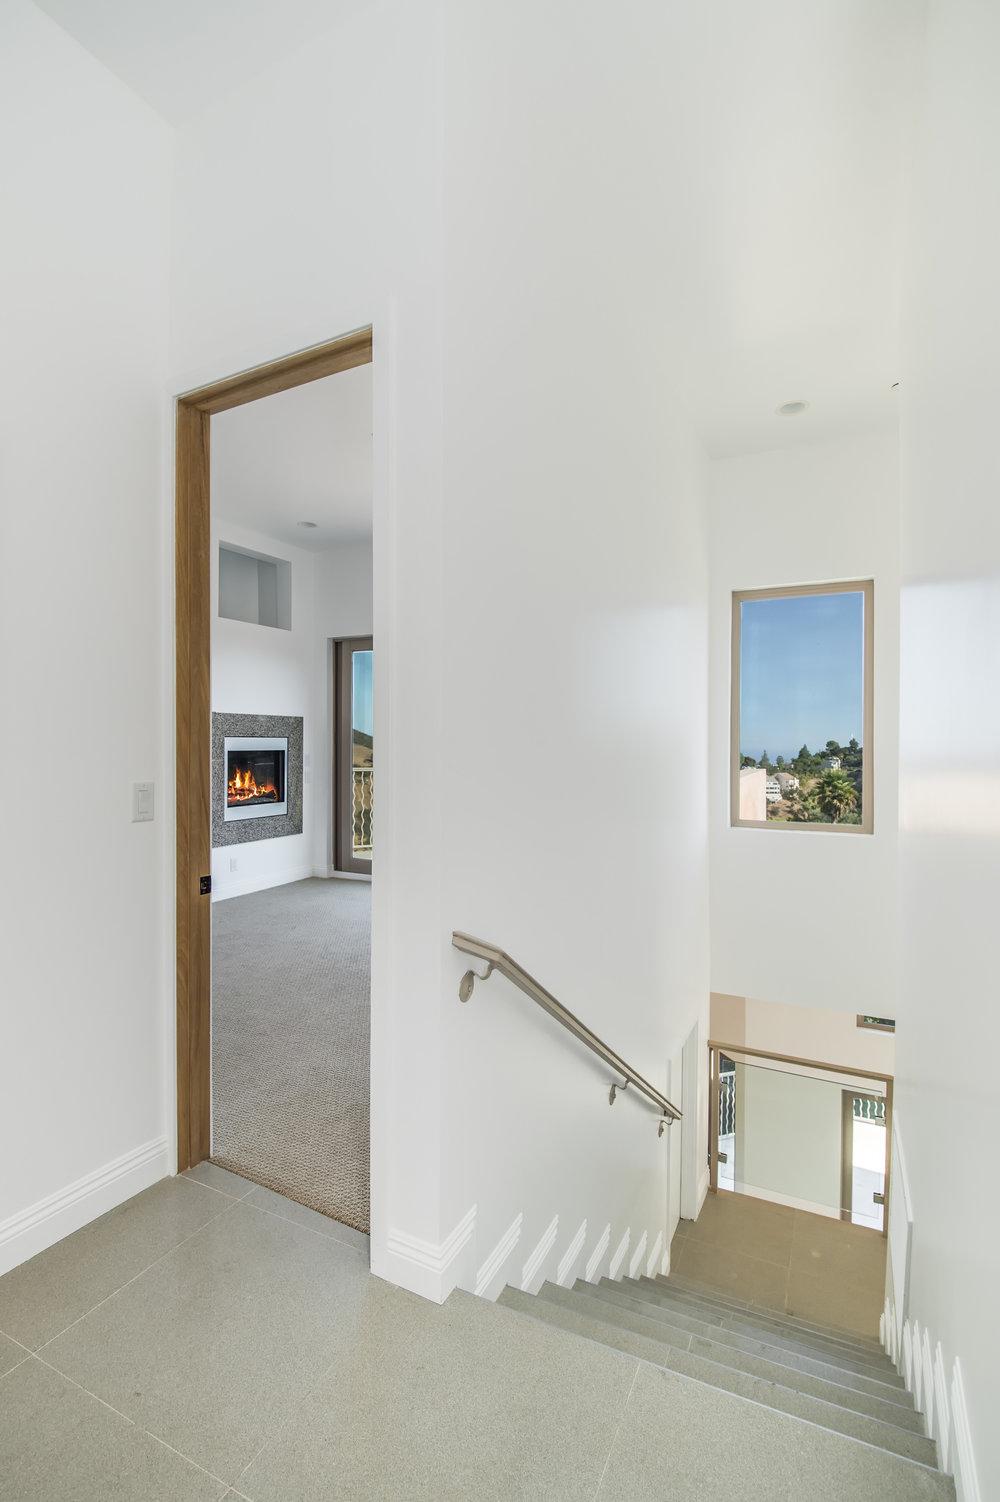 015 stairs 27126 Carrita Road Malibu For Sale Lease The Malibu Life Team Luxury Real Estate.jpg